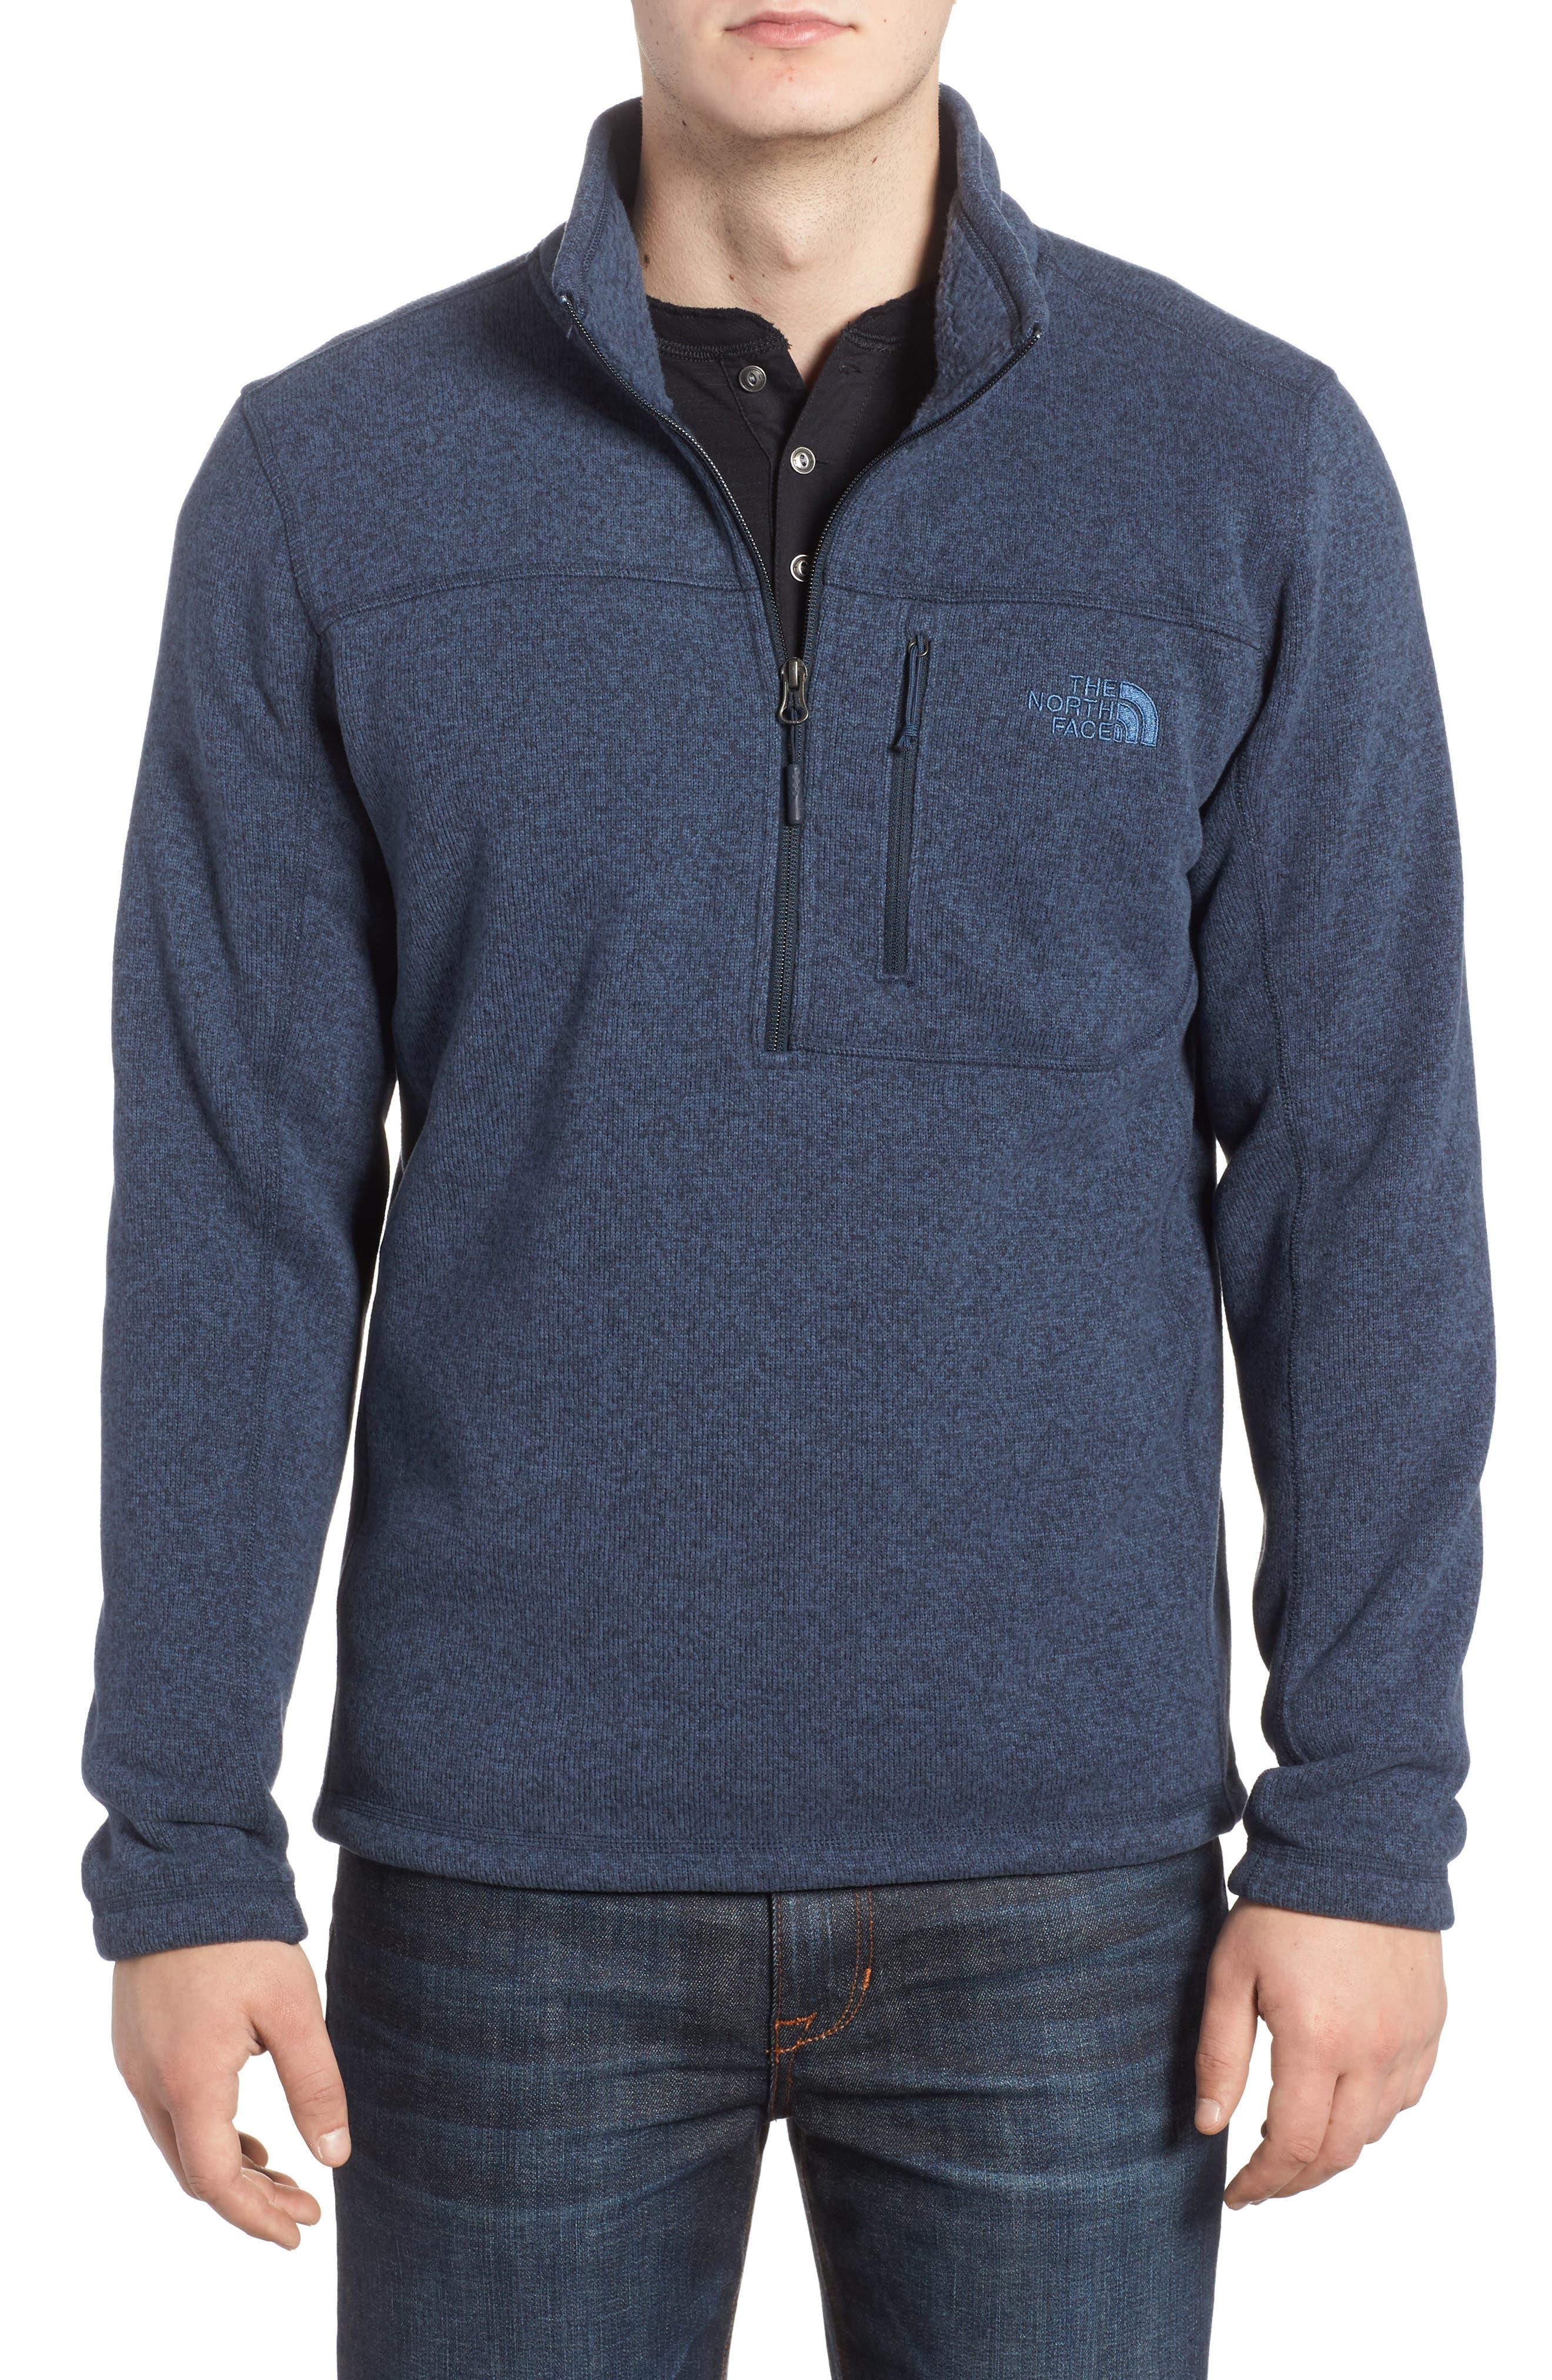 Gordon Lyons Quarter-Zip Fleece Jacket,                             Main thumbnail 1, color,                             URBAN NAVY HEATHER